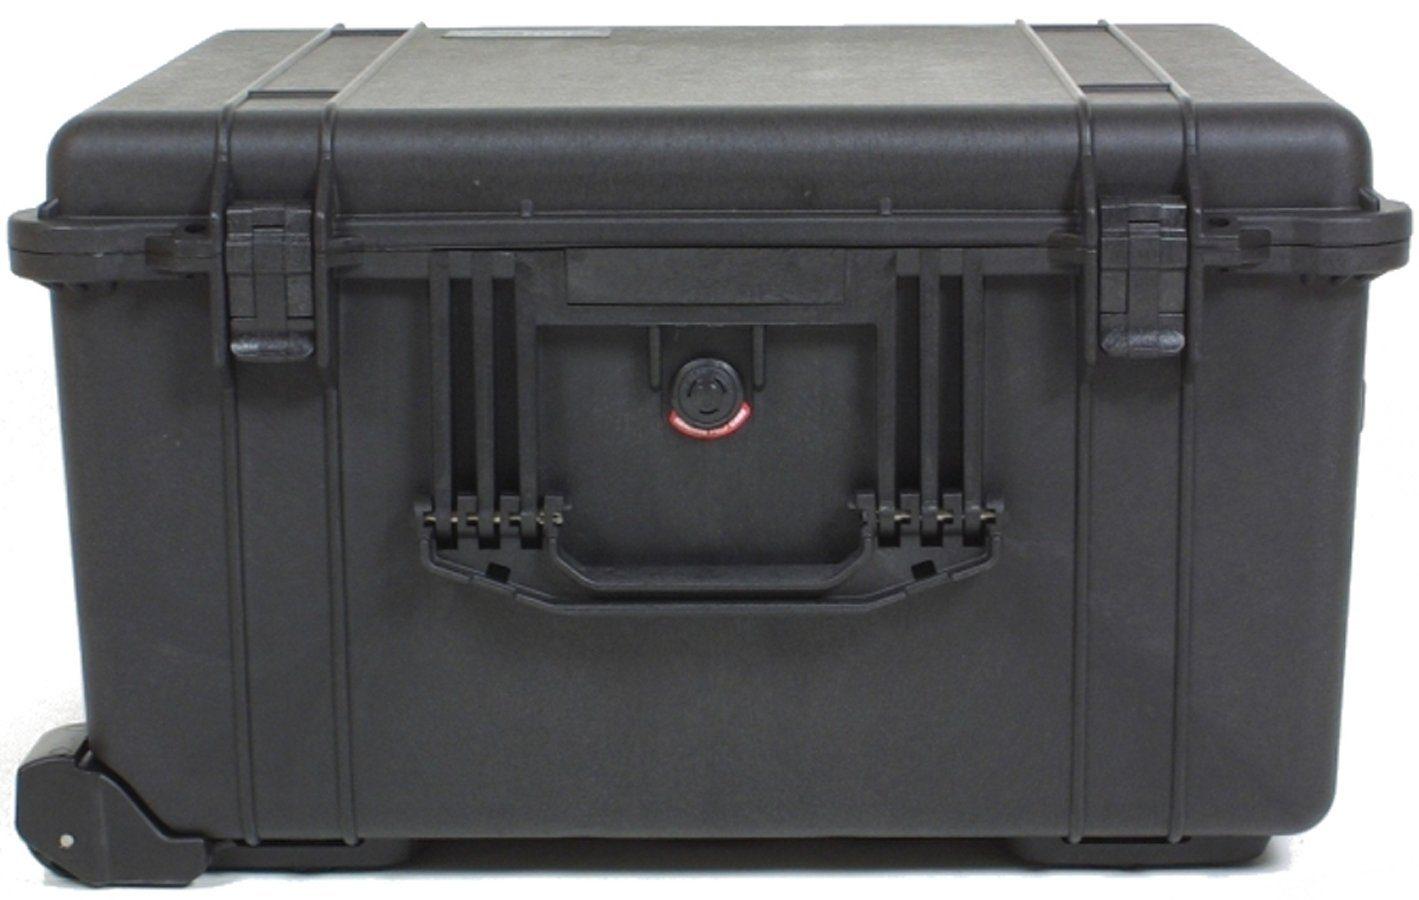 Peli Campingtruhe & -Kiste »1620 mit Schaumeinsatz«